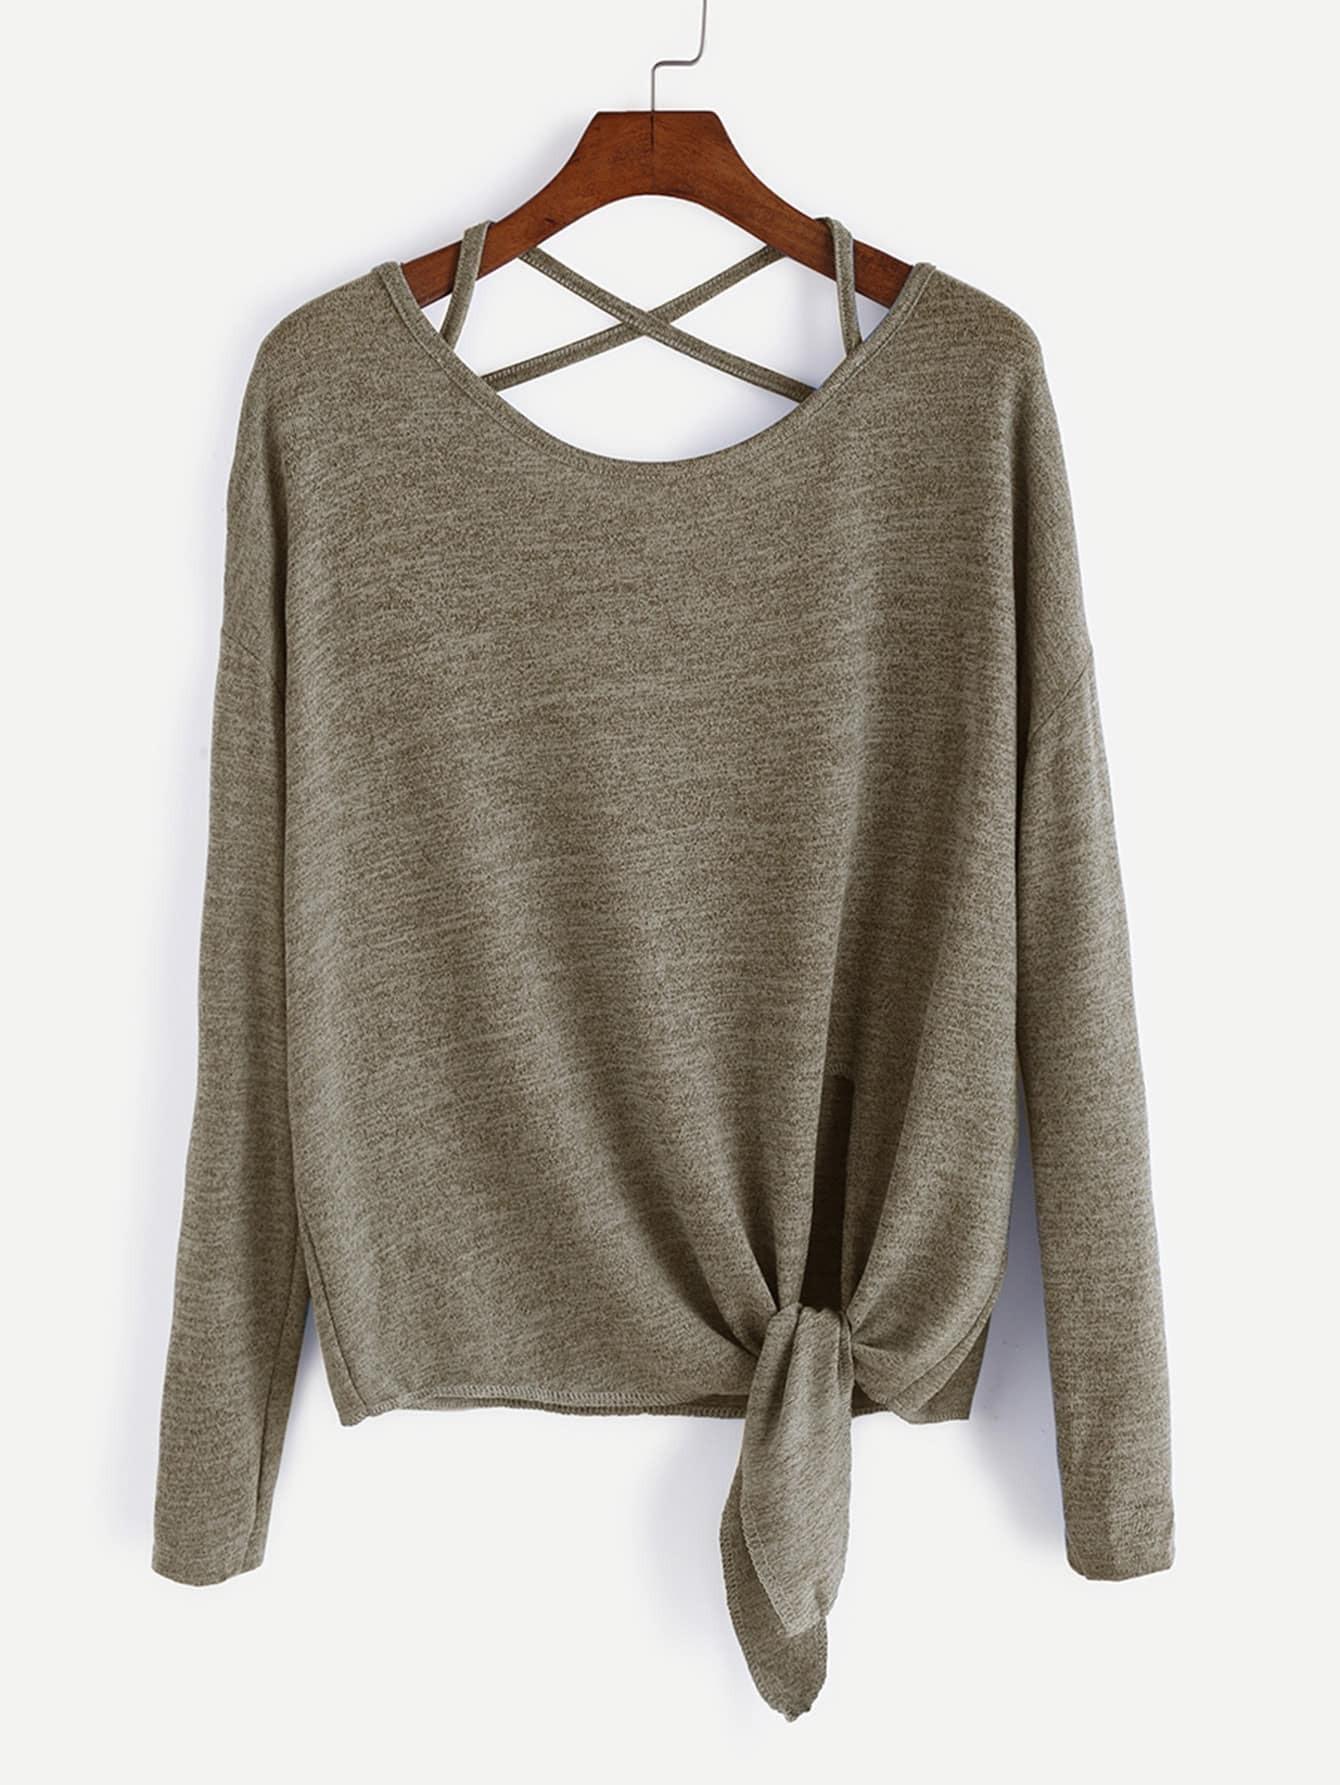 Drop Shoulder Criss Cross Tie Front T-Shirt bow tie front drop shoulder sweatshirt